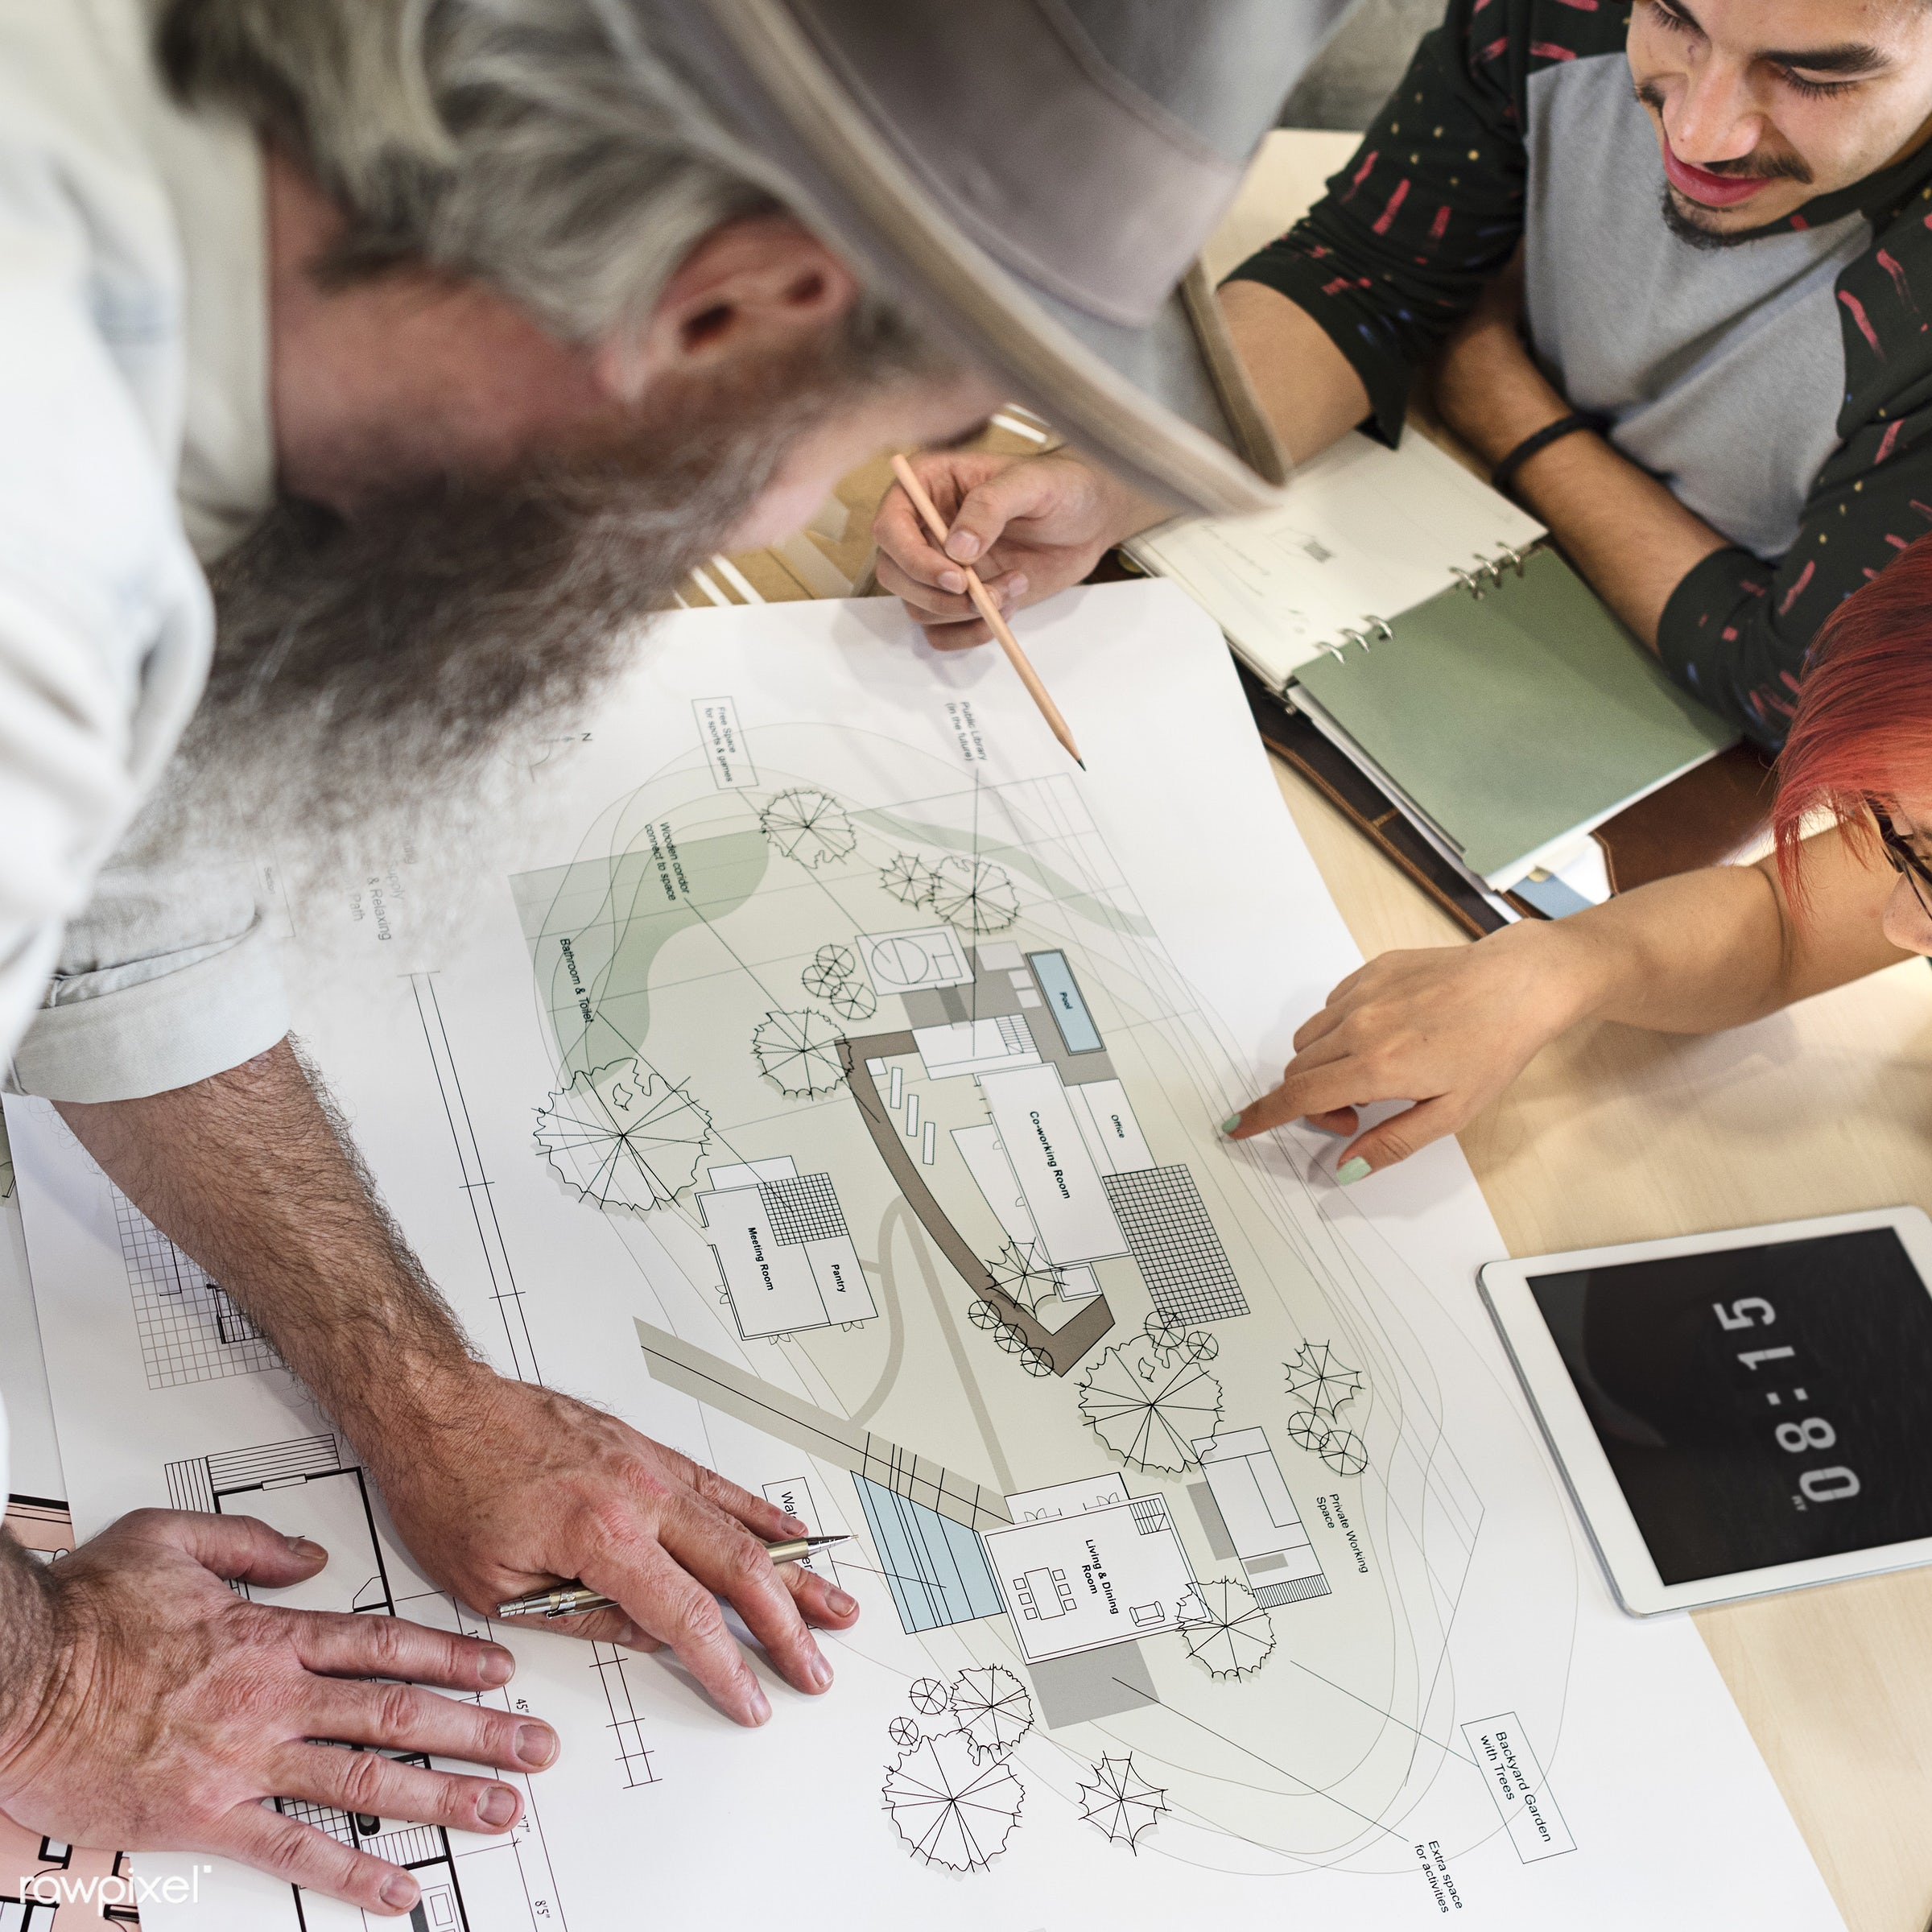 architect, architecture, assistance, blueprint, brainstorming, communication, connection, creative occupation, creativity,...